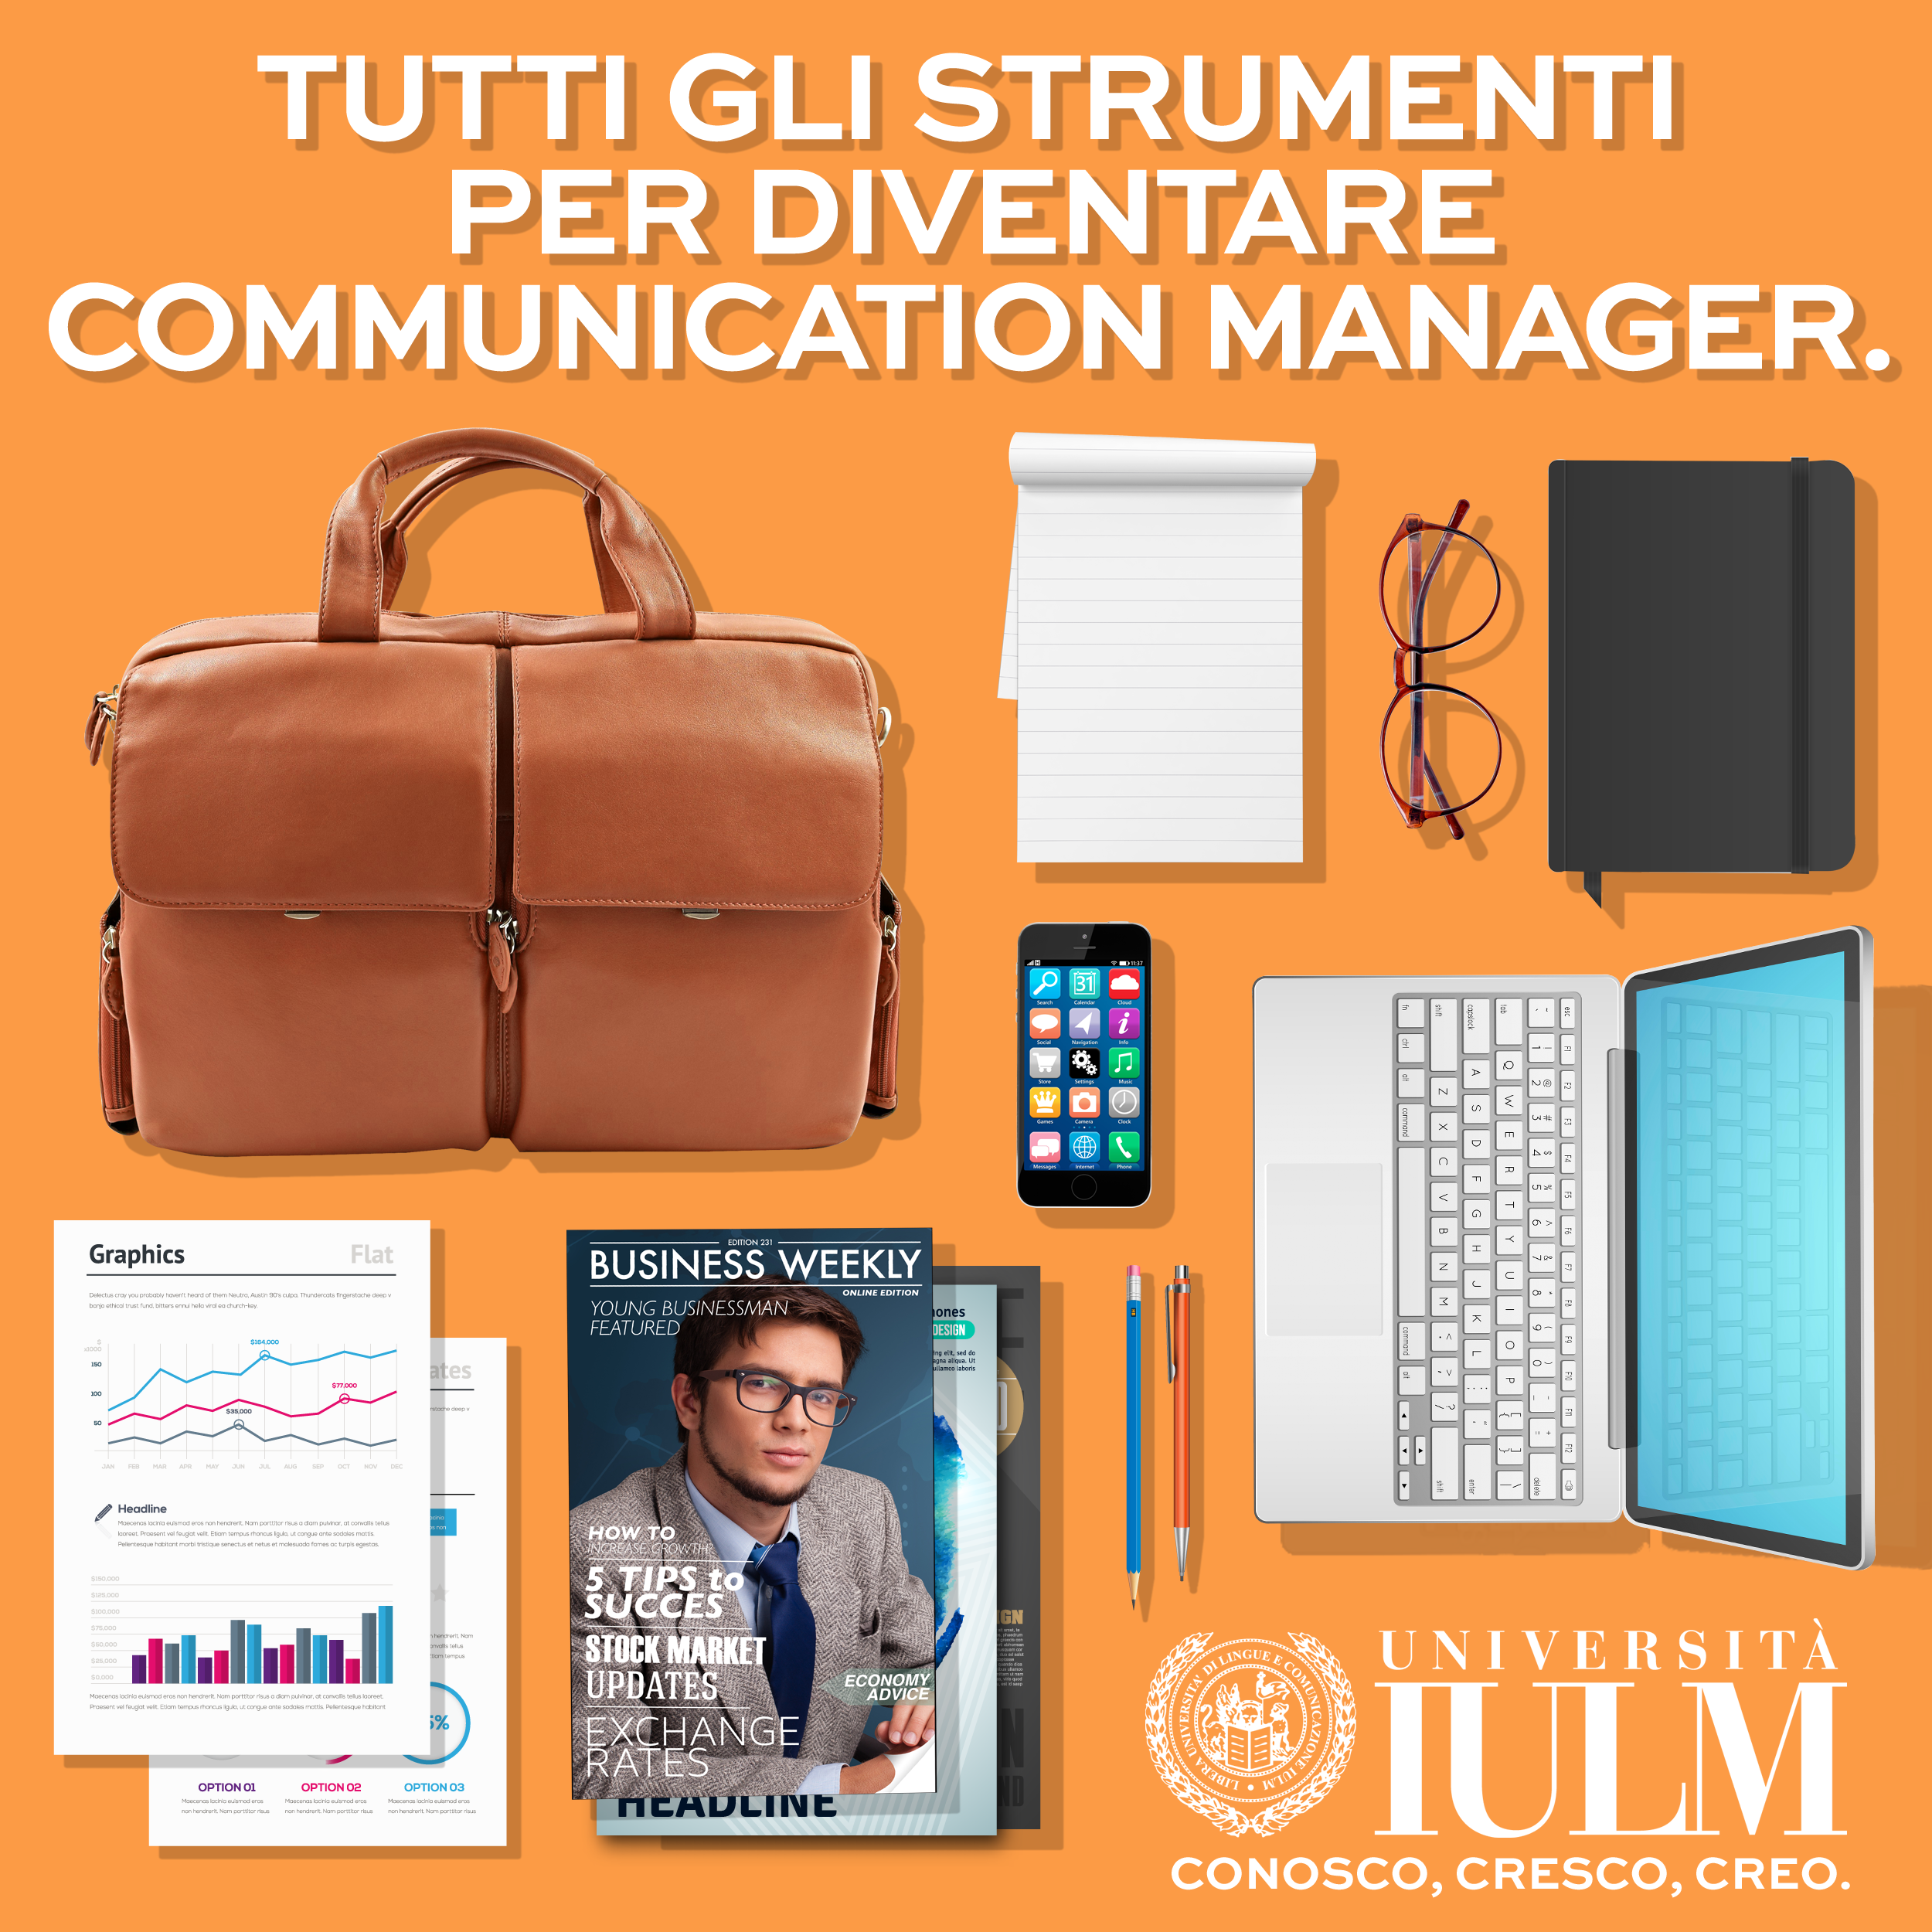 communic_manager-oggetti